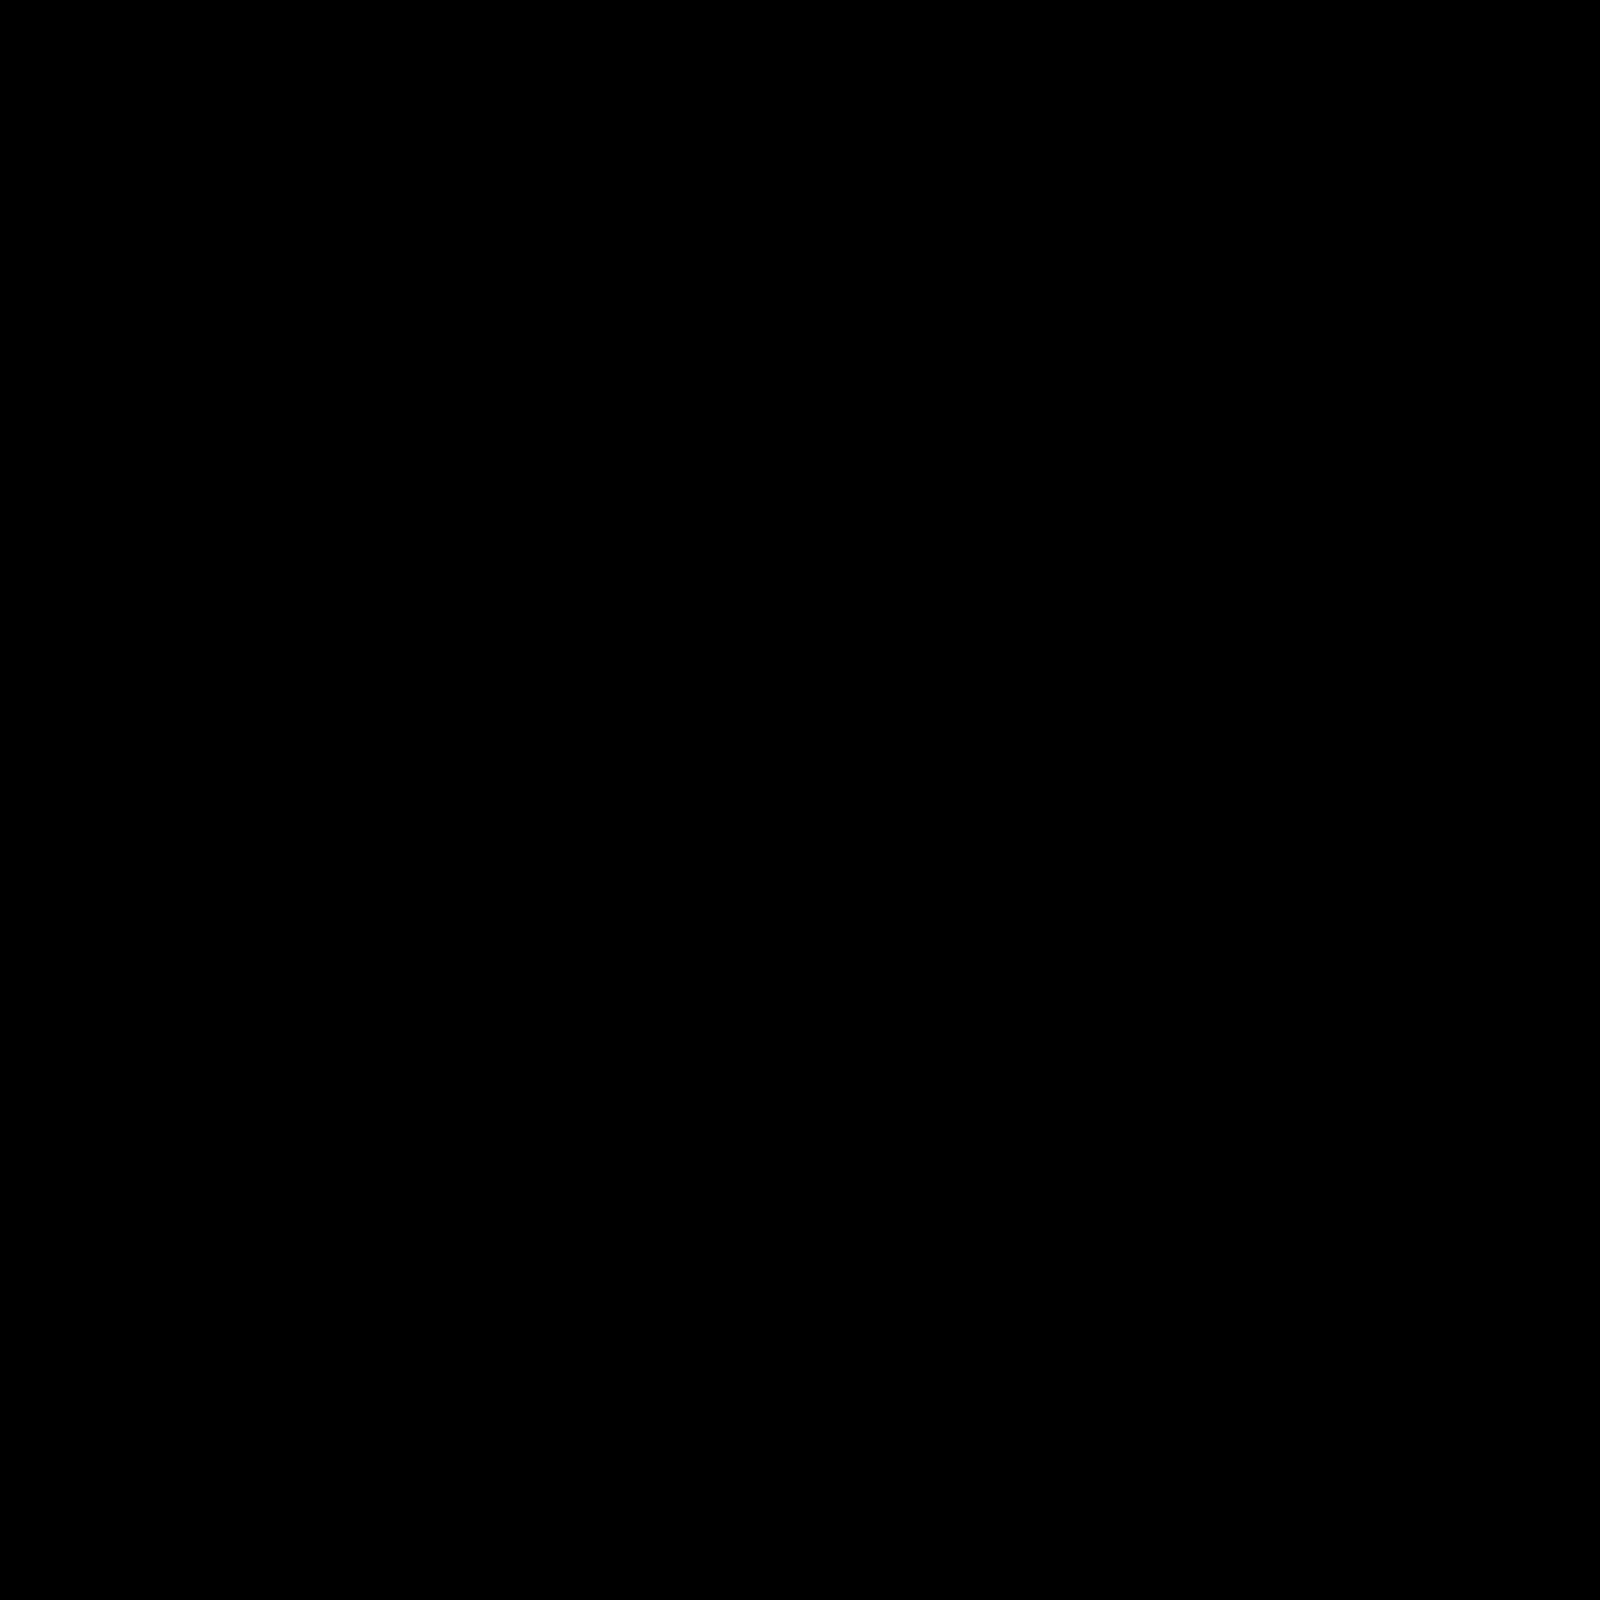 power button clip symbol symbols logos graphics icons buttons 1600